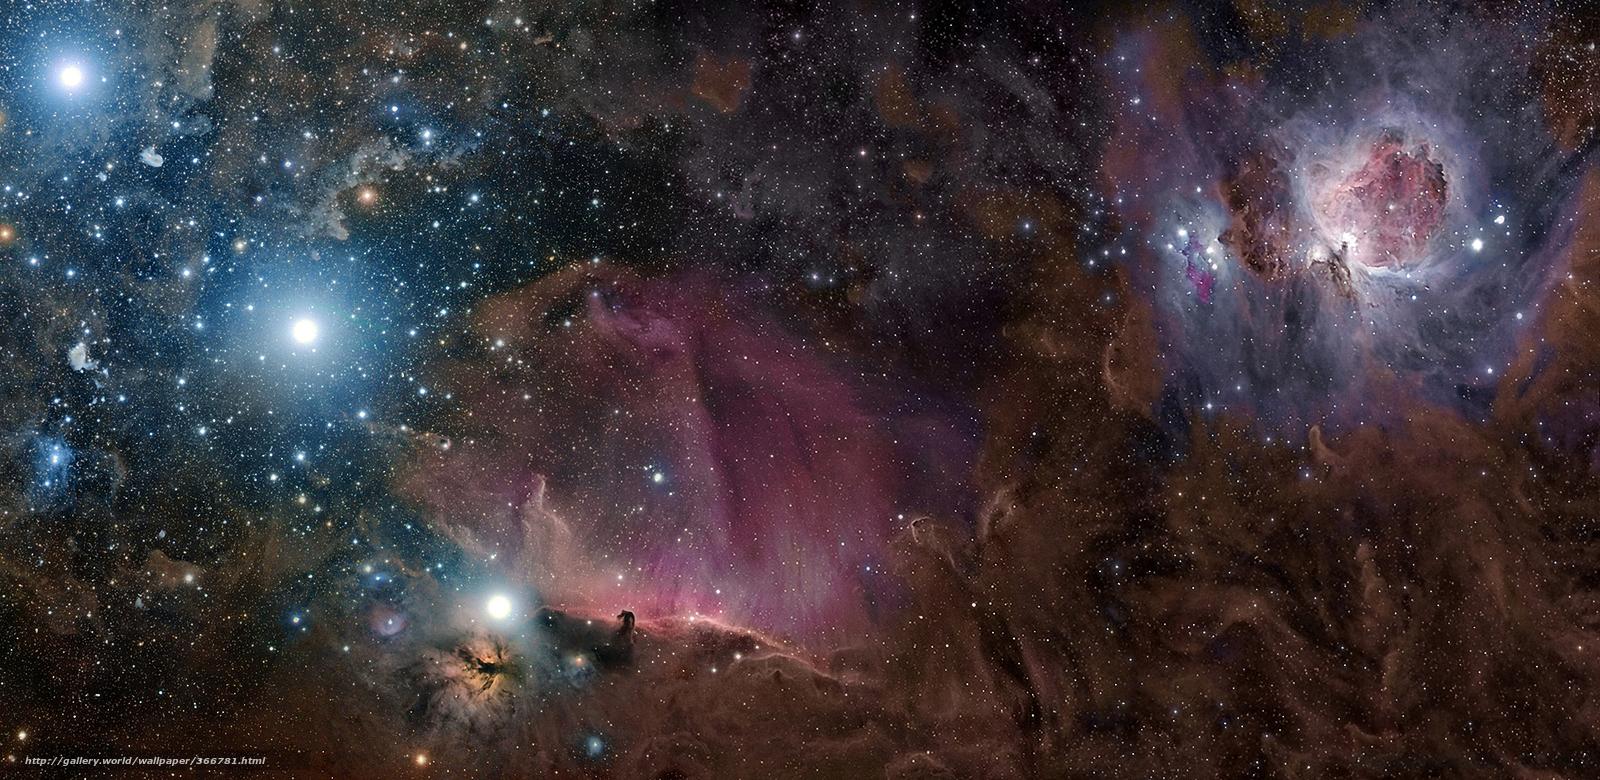 nebula space dust star - photo #8